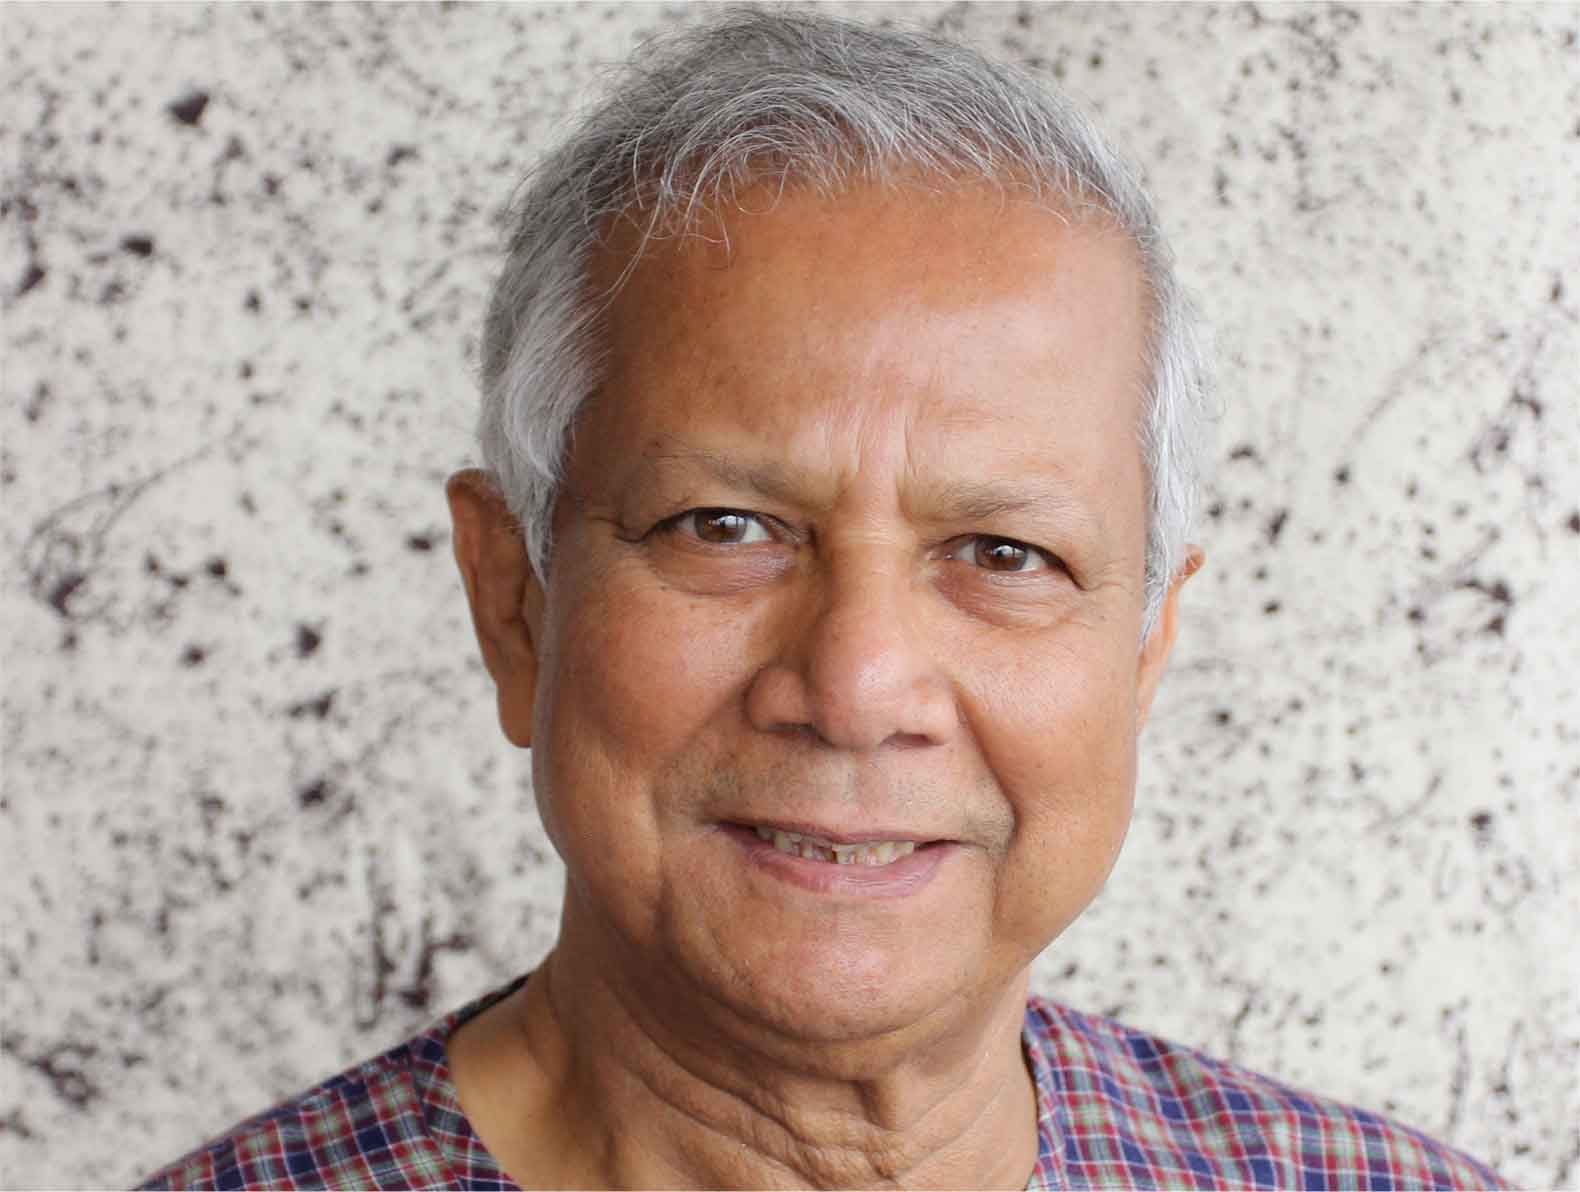 professor Muhammad Yunus smiling for the camera